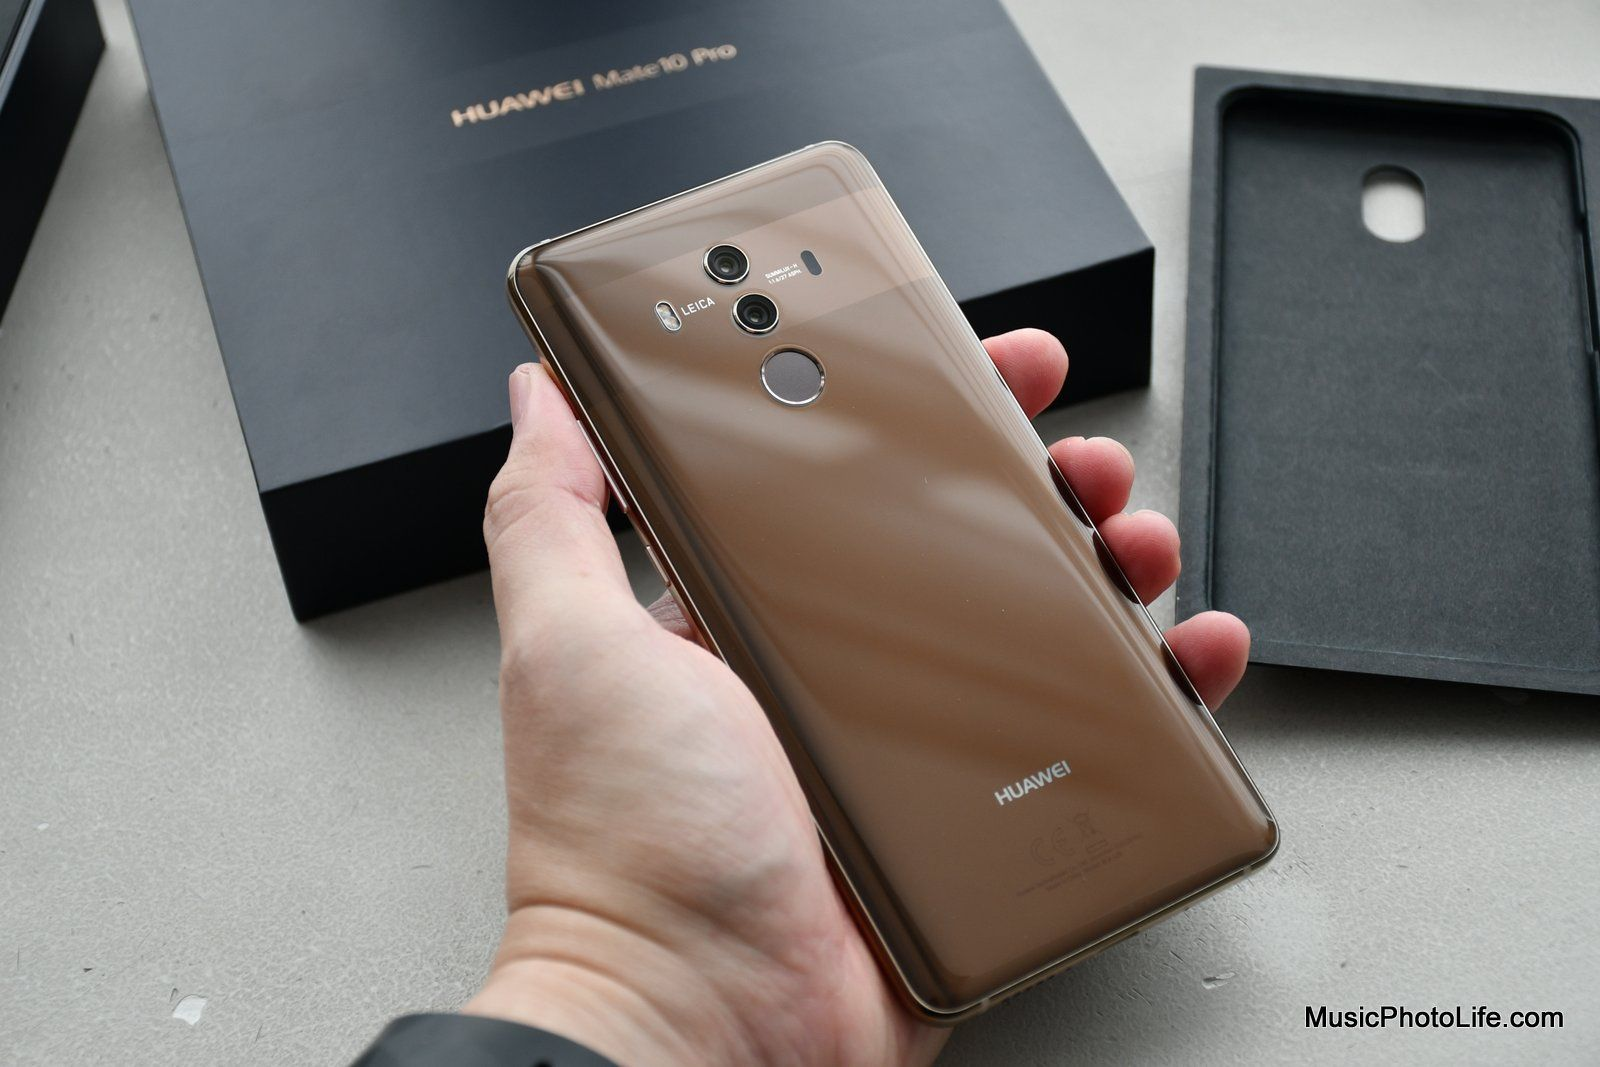 Huawei Mate 10 Pro Hands On Review By Musicphotolife Com Huawei Mate 10 Things Huawei